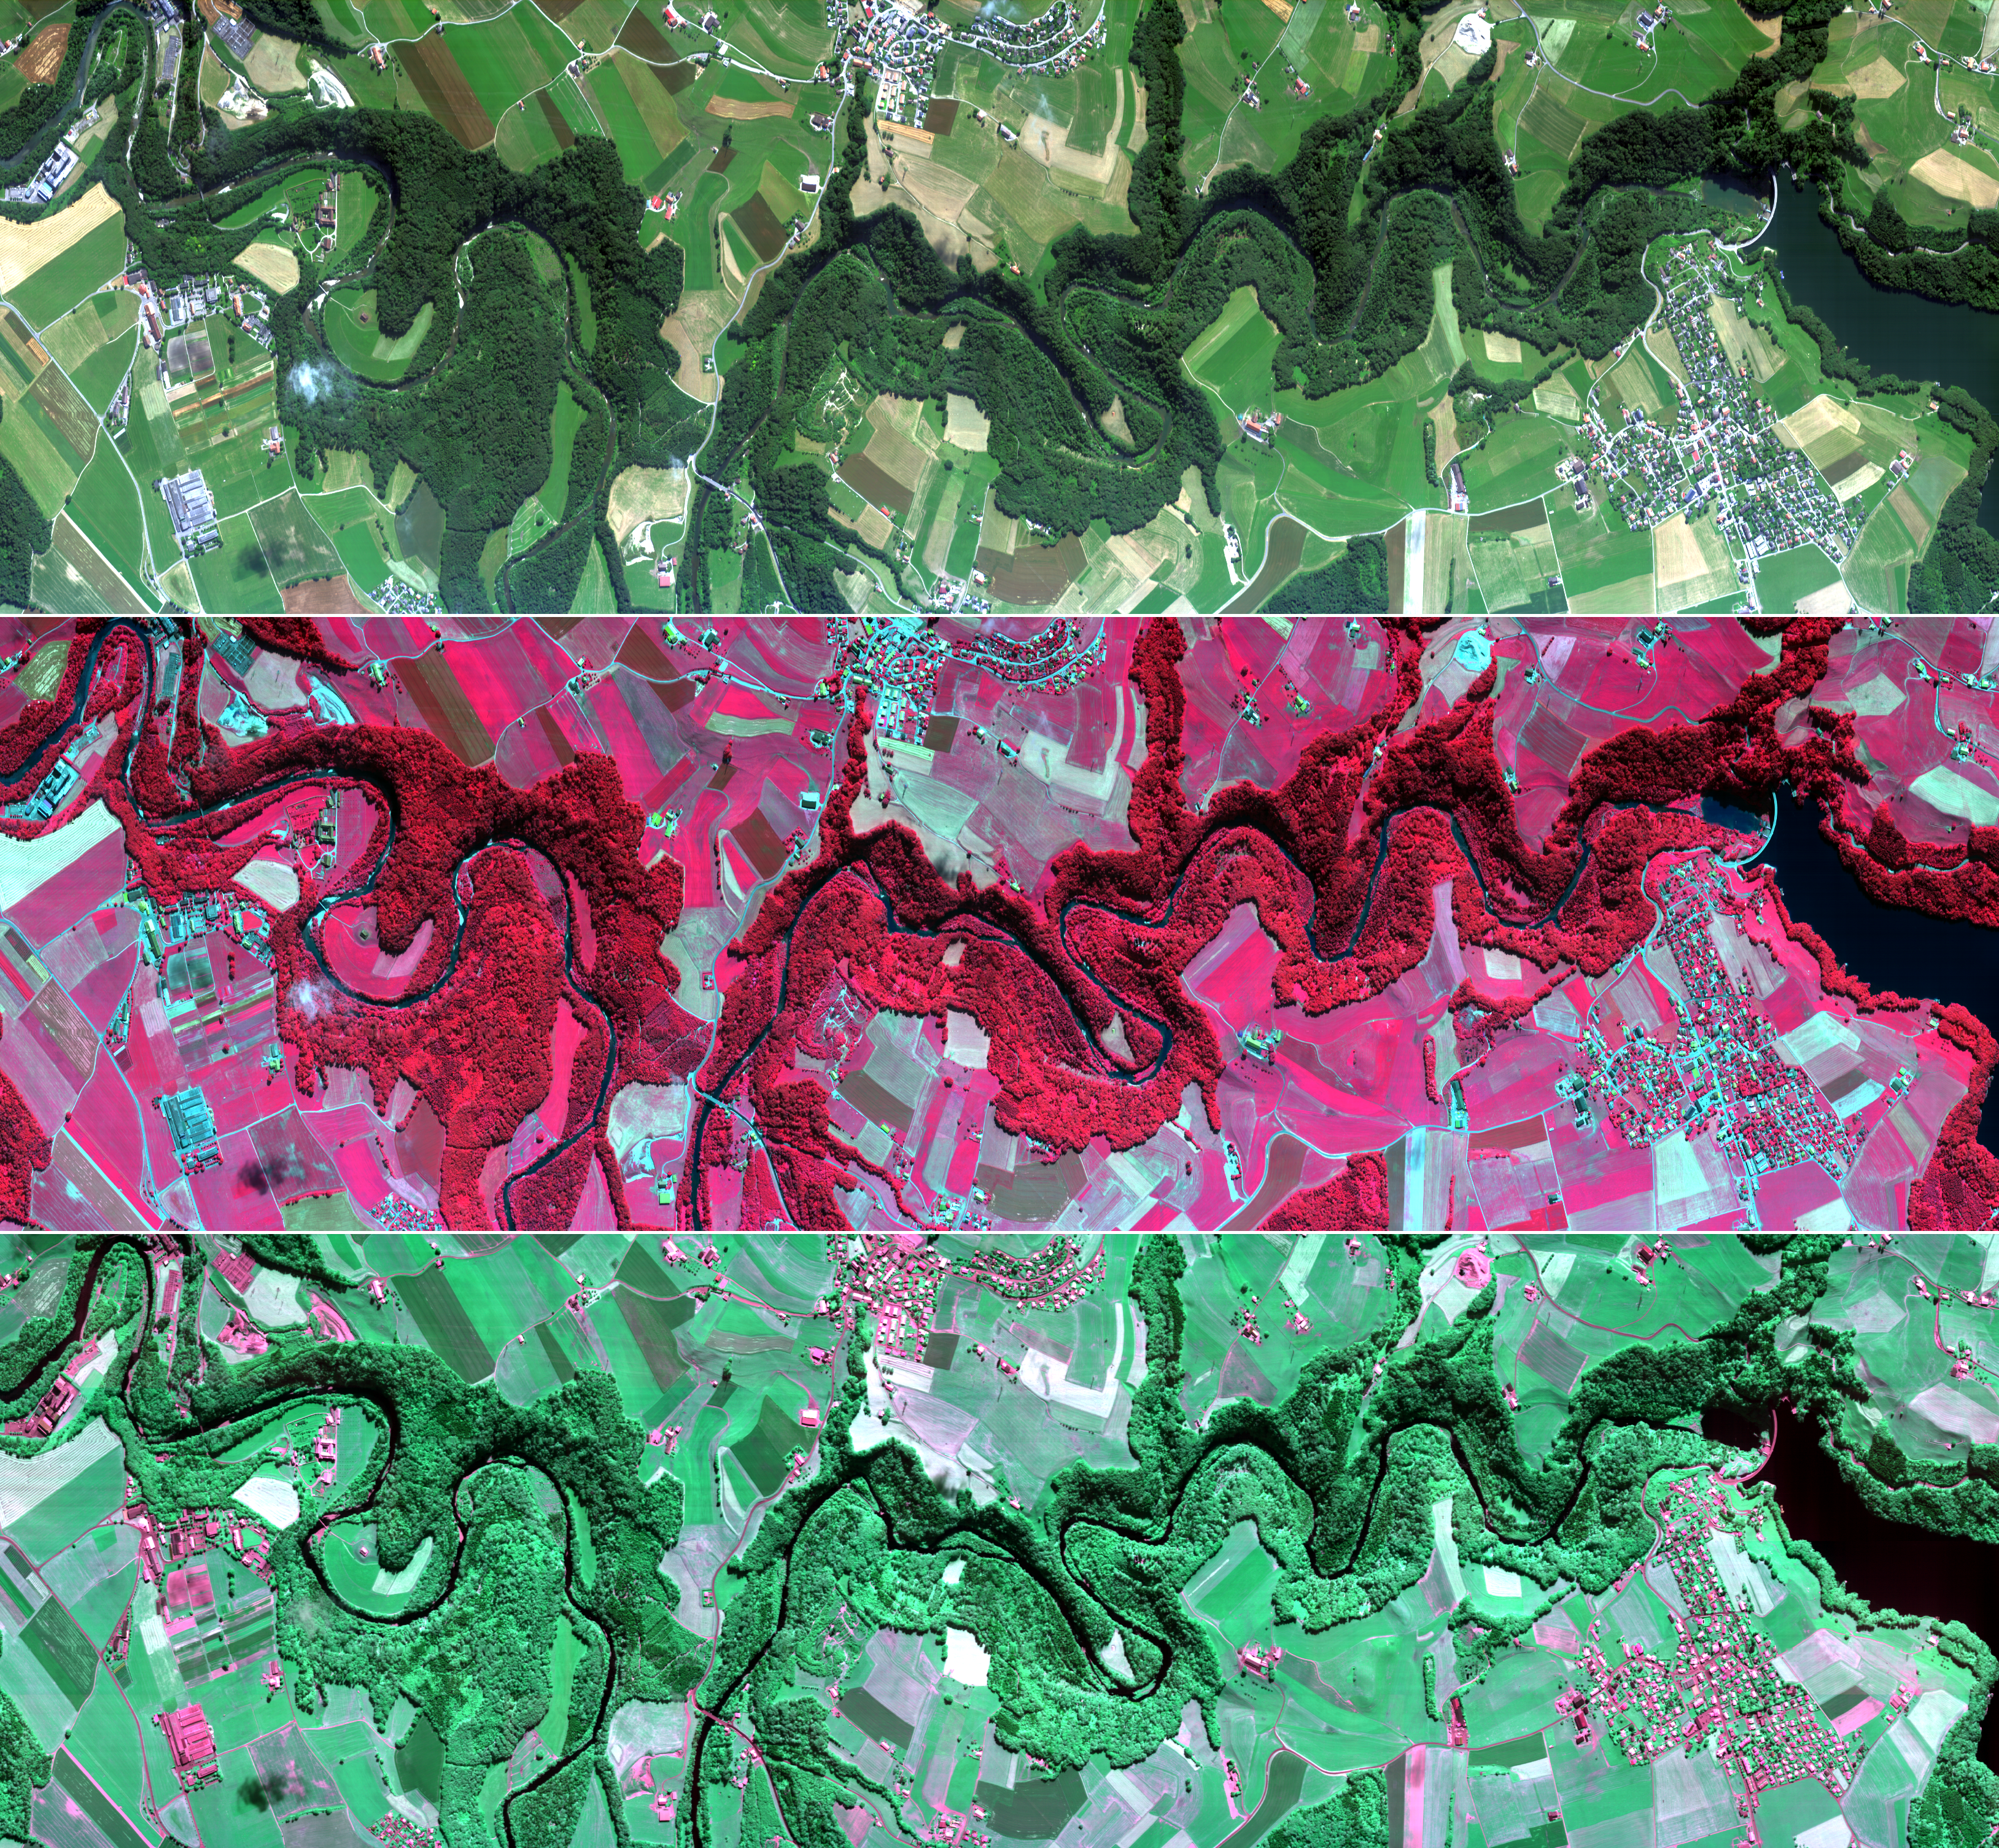 SARIN_a01_RGB_CIR_CHC_Mosaic_Horizontal-1.png